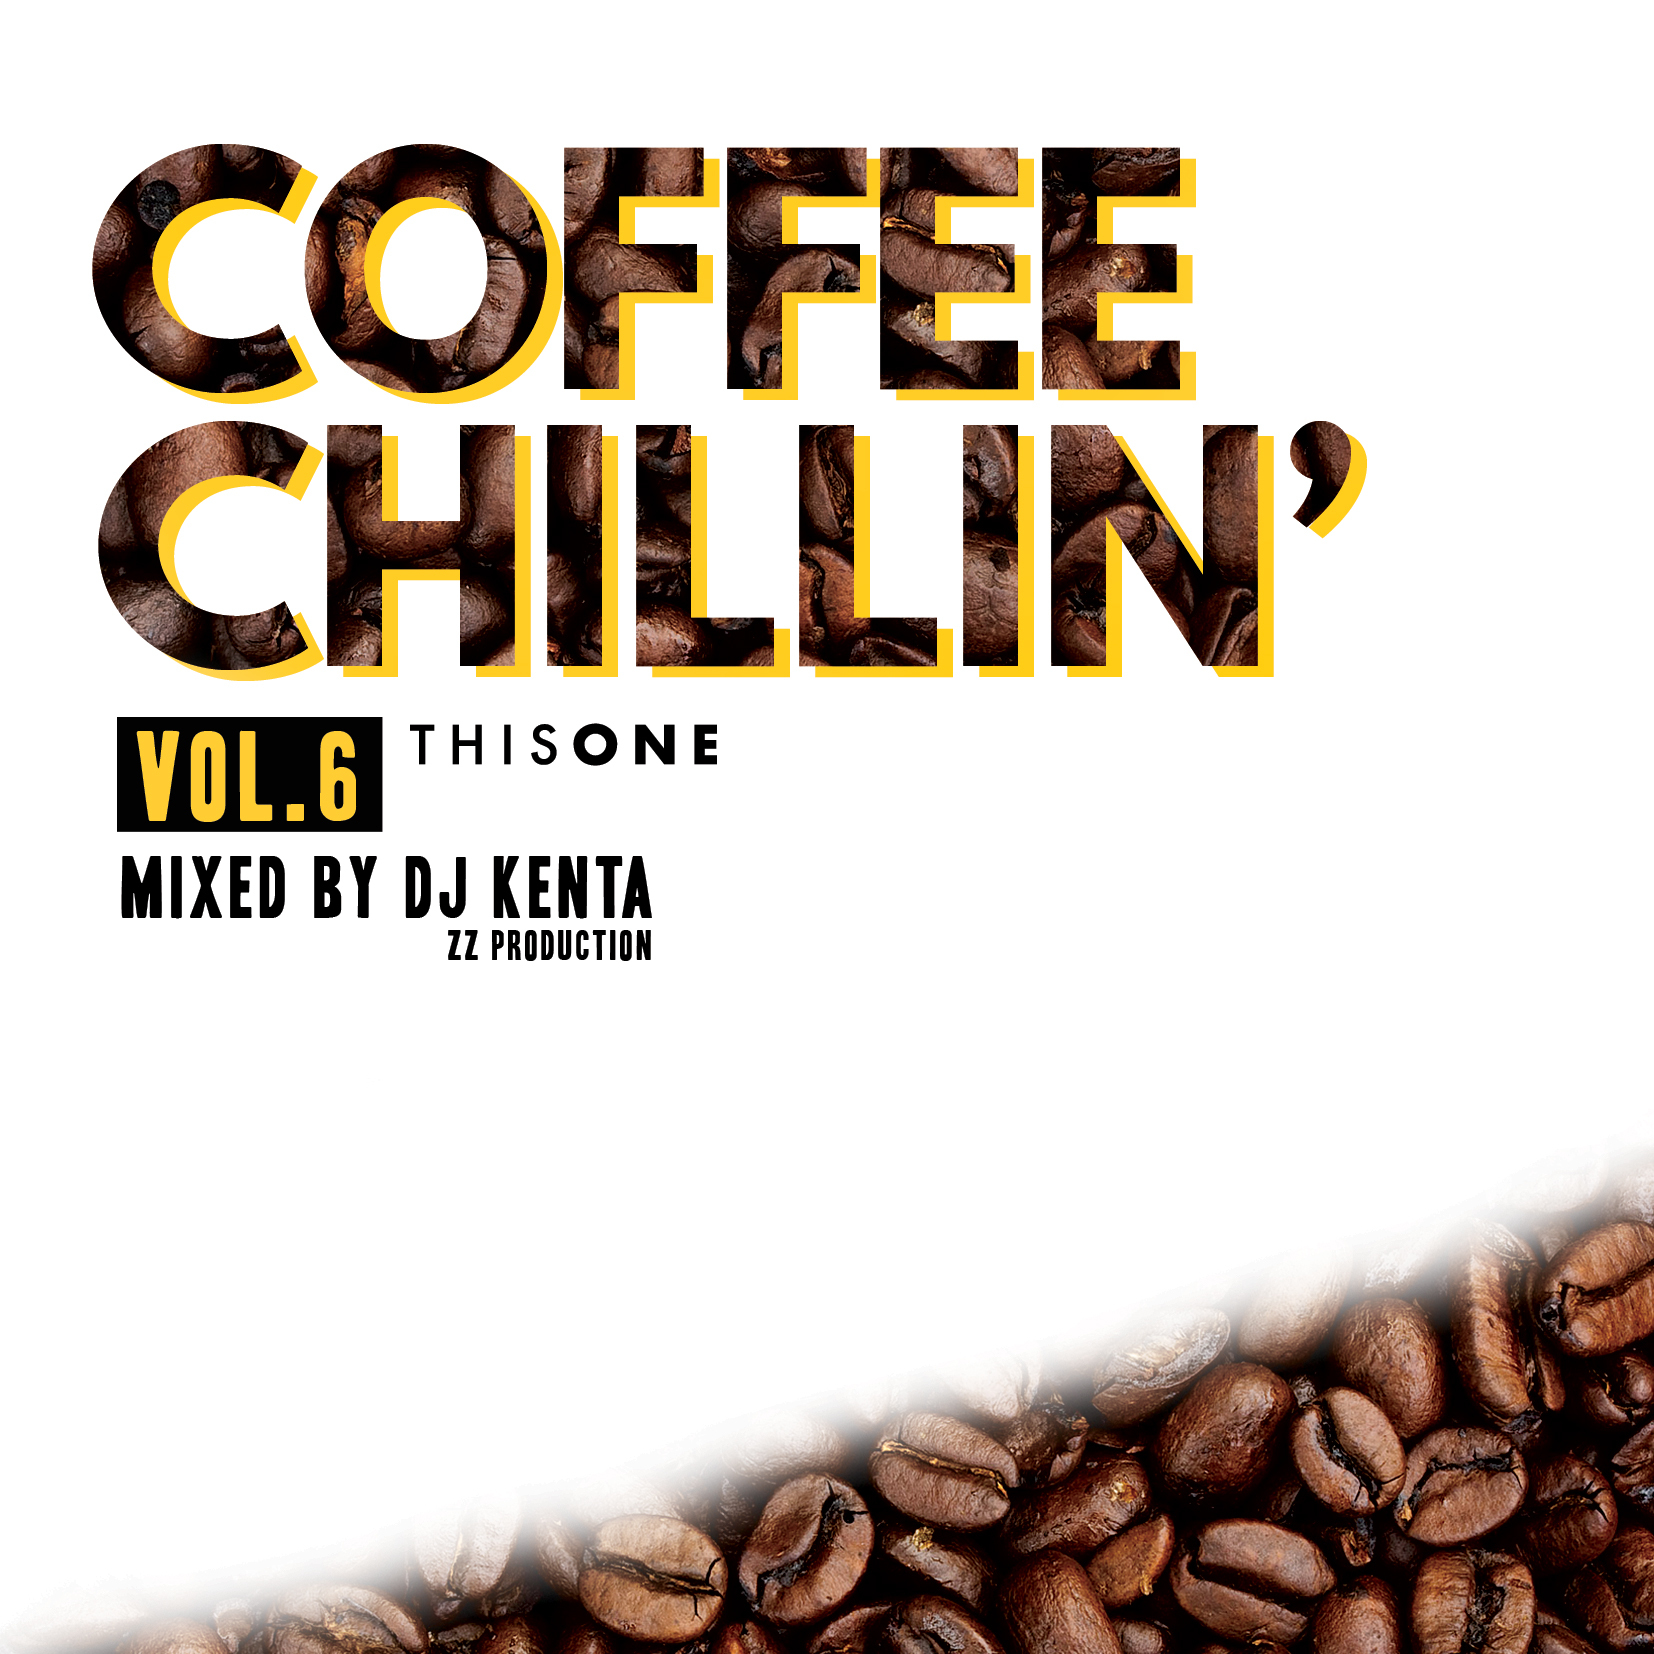 [MIX CD] DJ KENTA (ZZ PRODUCTION) / COFFEE CHILLIN' -vol.6-